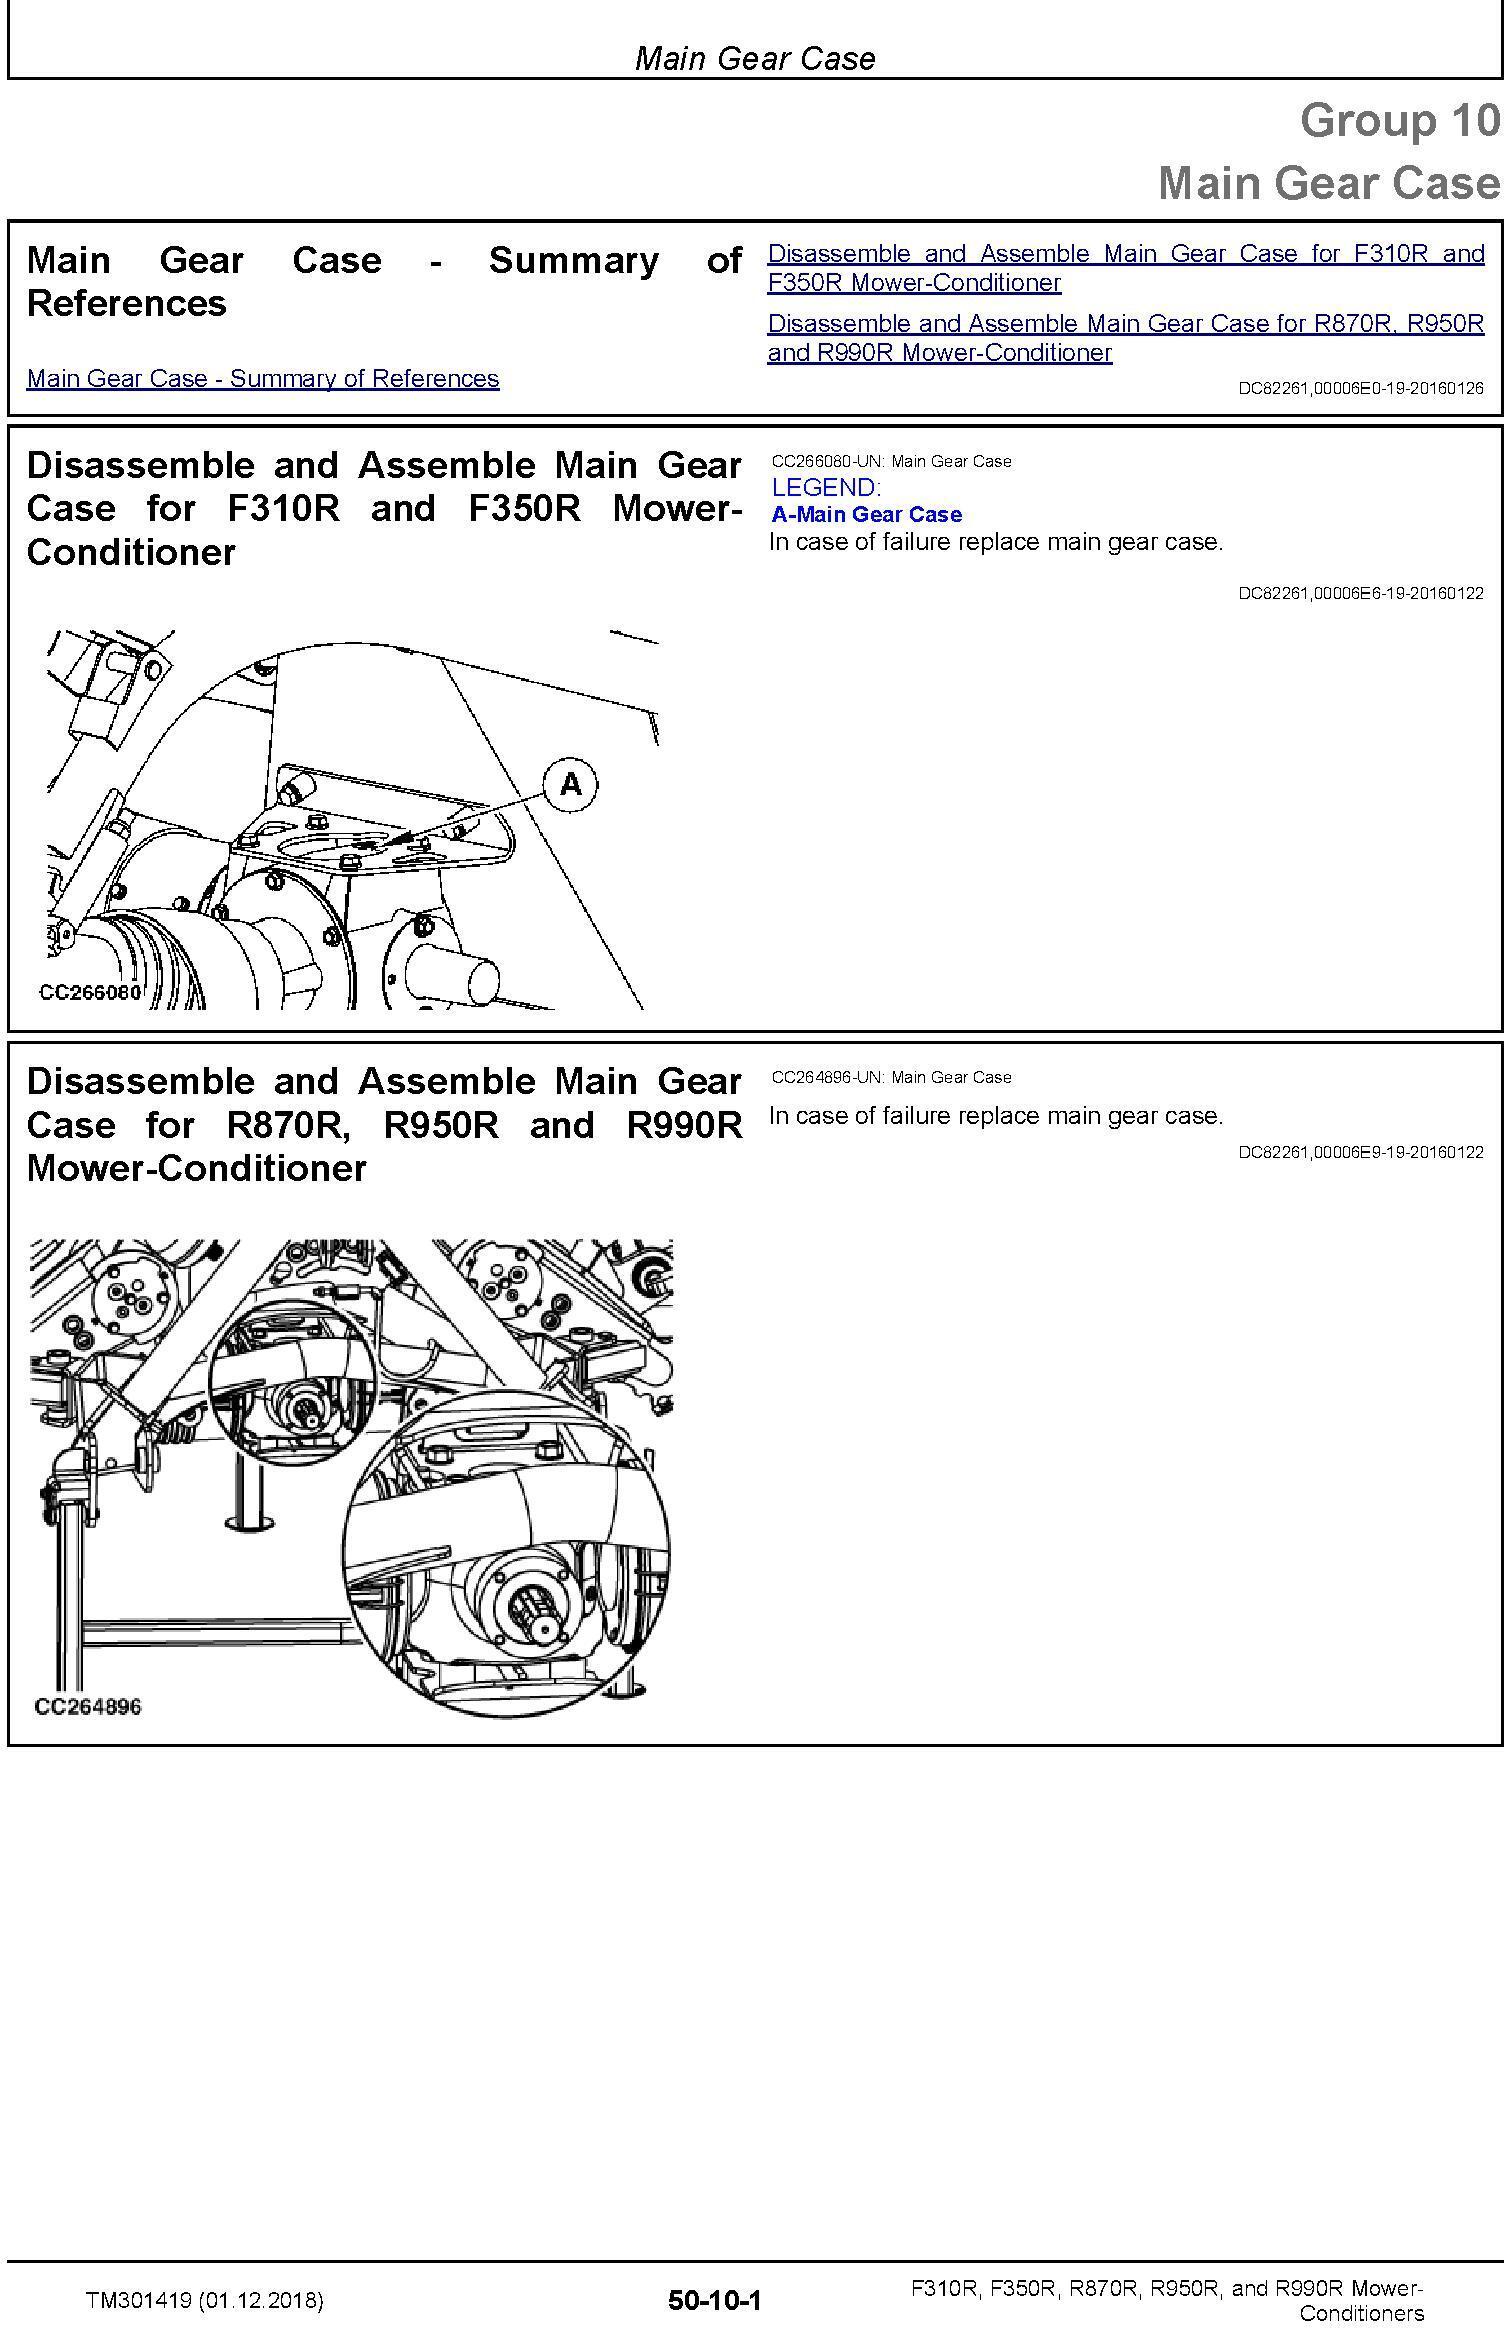 John Deere F310R, F350R, R870R, R950R and R990R Mower-Conditioners Technical Manual (TM301419) - 1